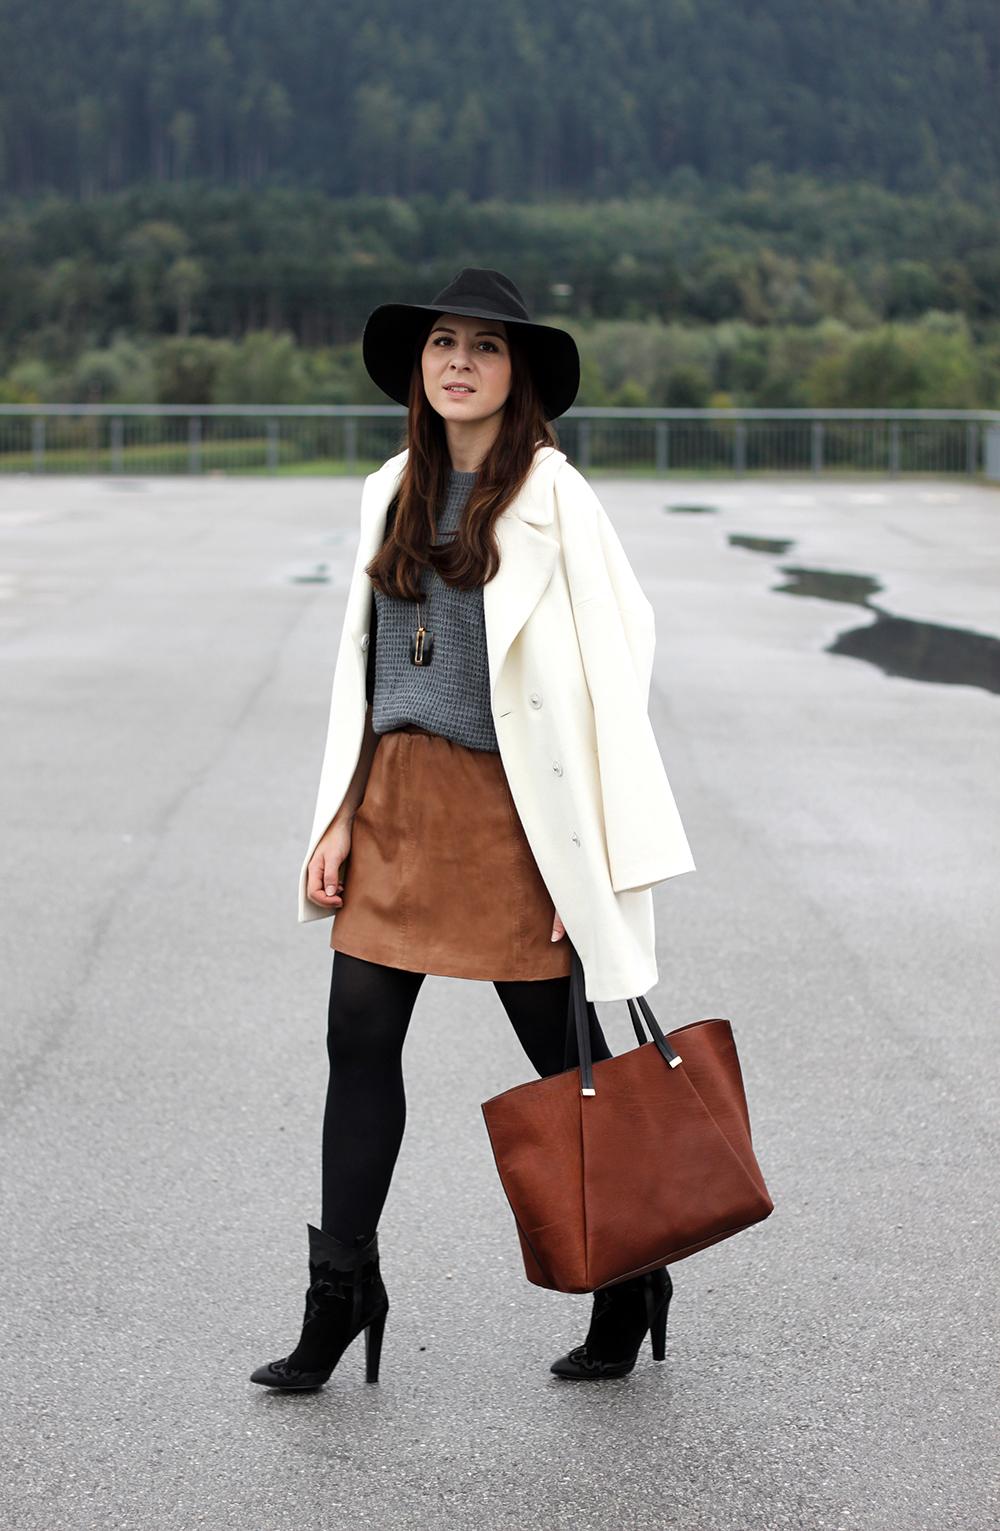 who is mocca, fashionblog tirol, fashionblog österreich, lederrock mango, grauer pullover, zara boots isabel marant, ledershopper H&M, fedora hut topshop, daniel wellington uhr